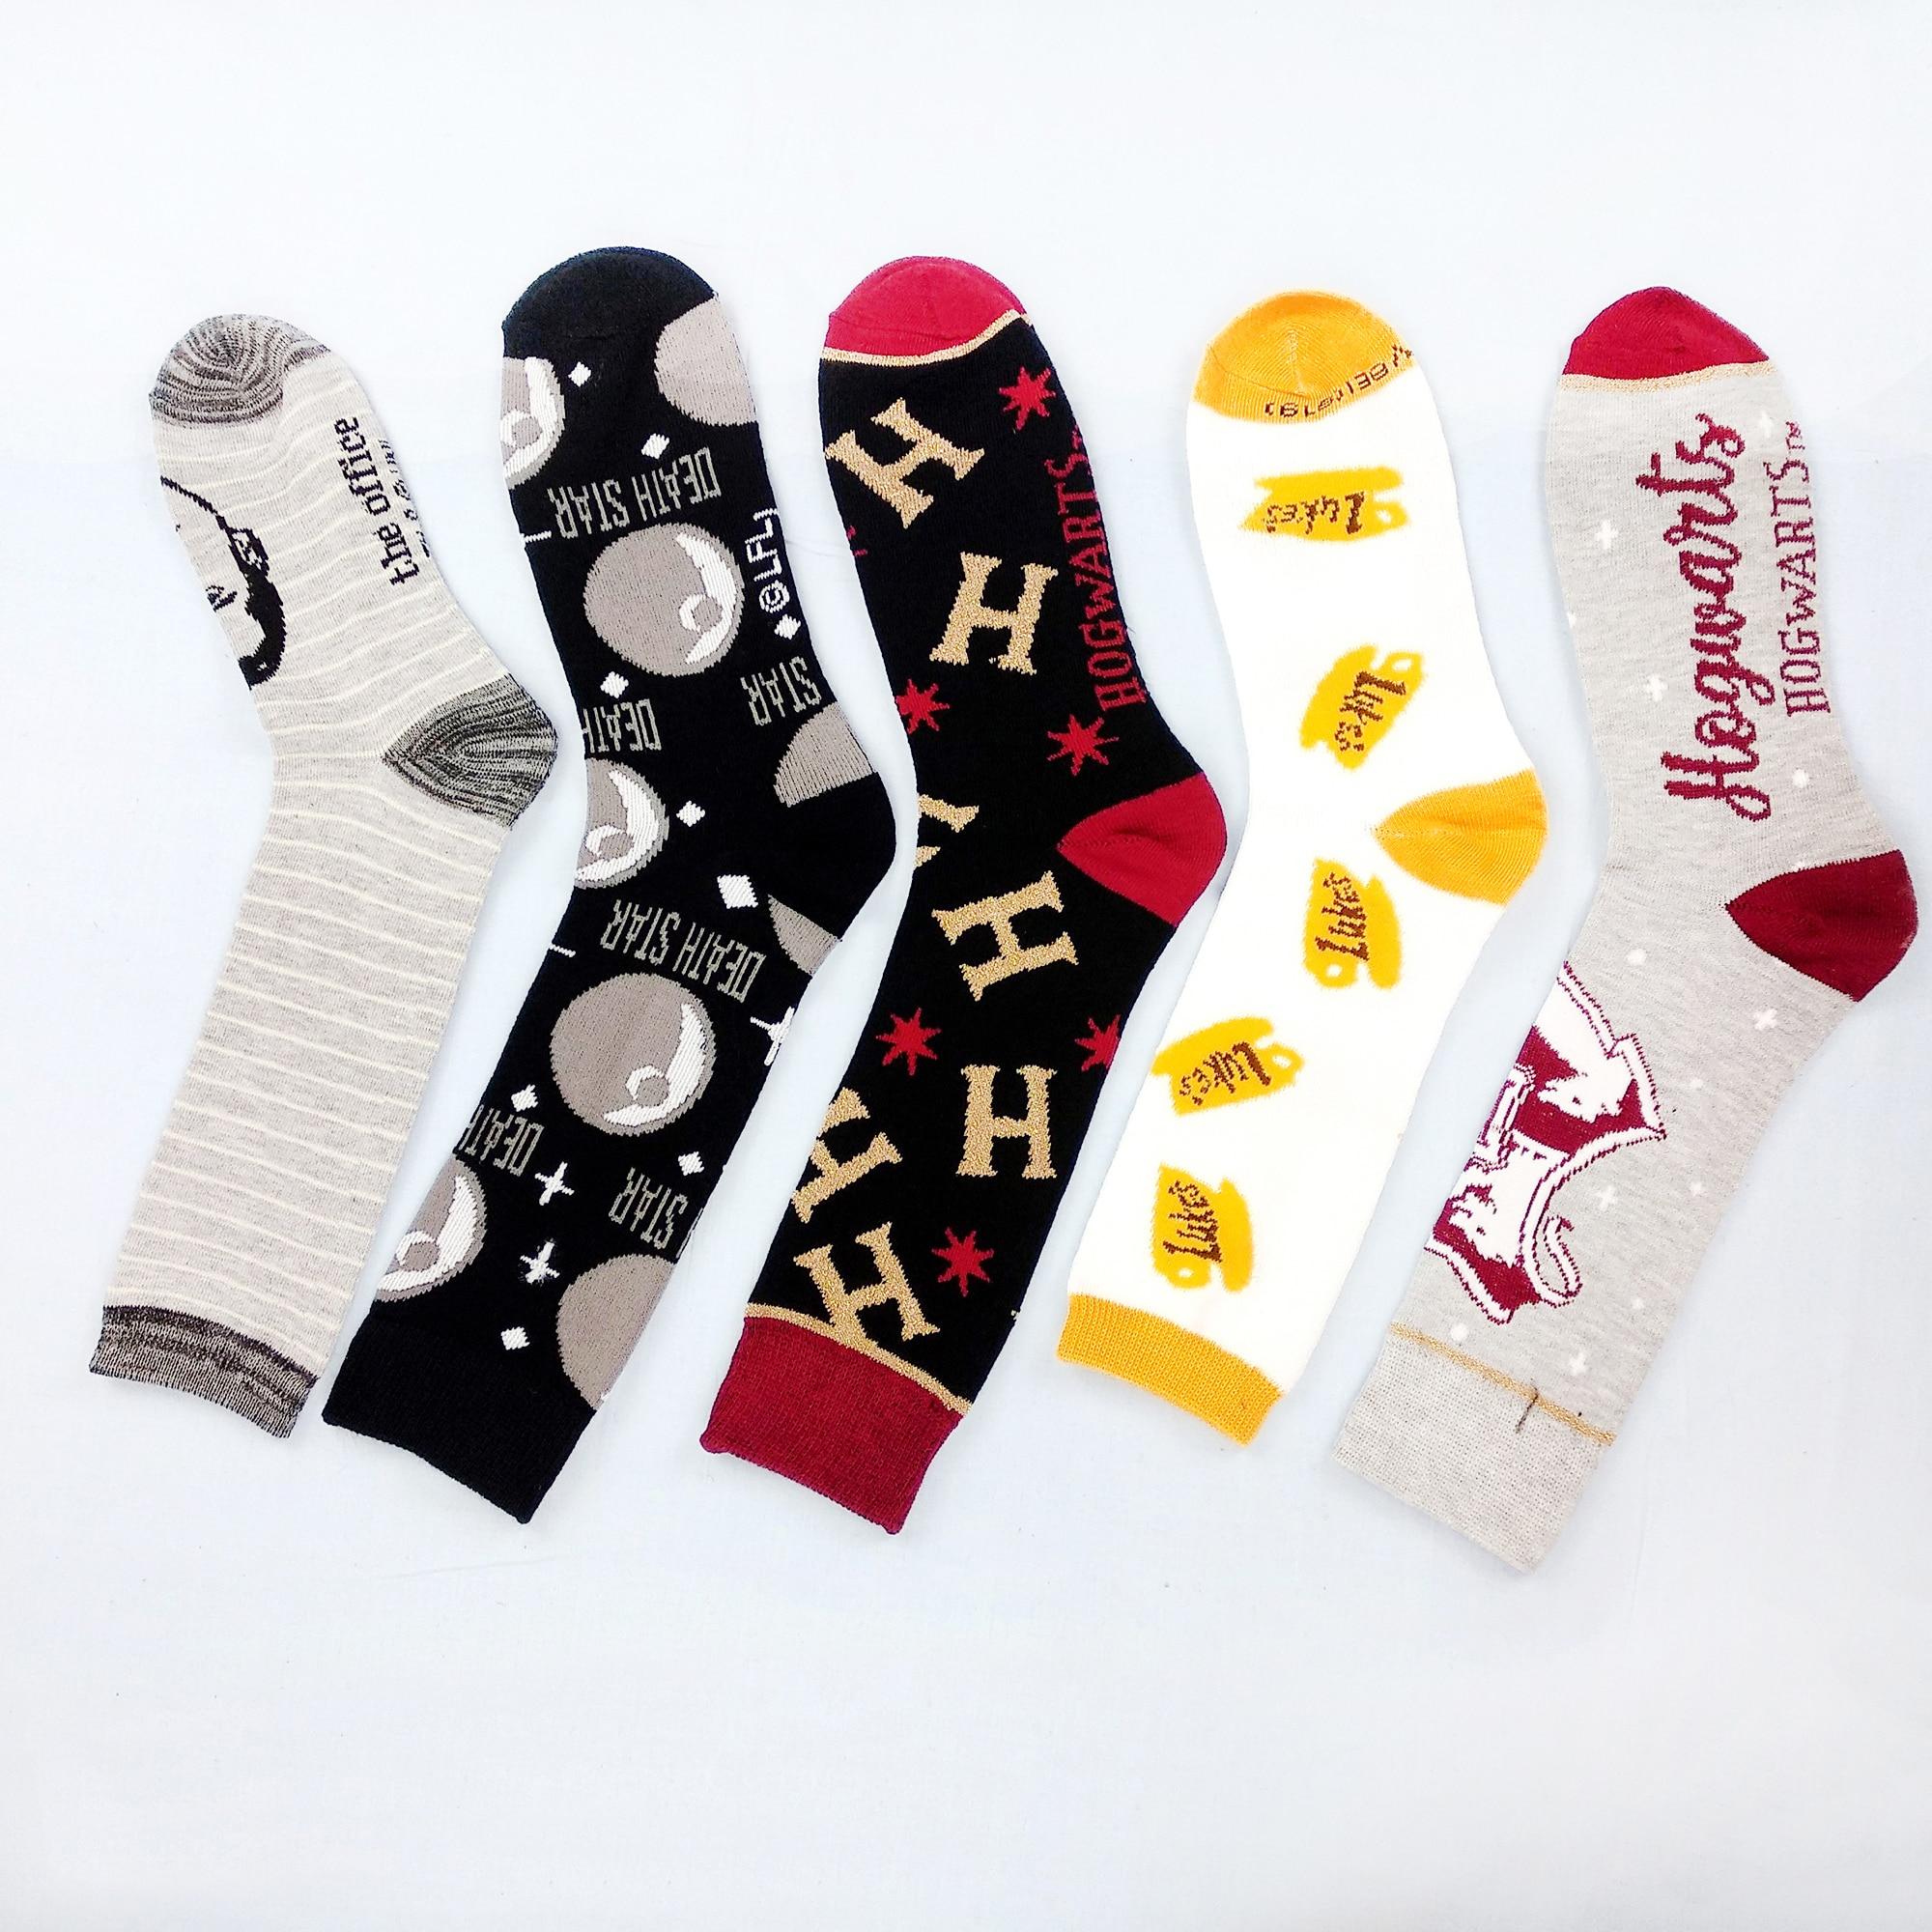 Colorful Funny Men Dress Socks Cotton Classic Cartoon Print Womens Socks Casual Street Style Short Socks